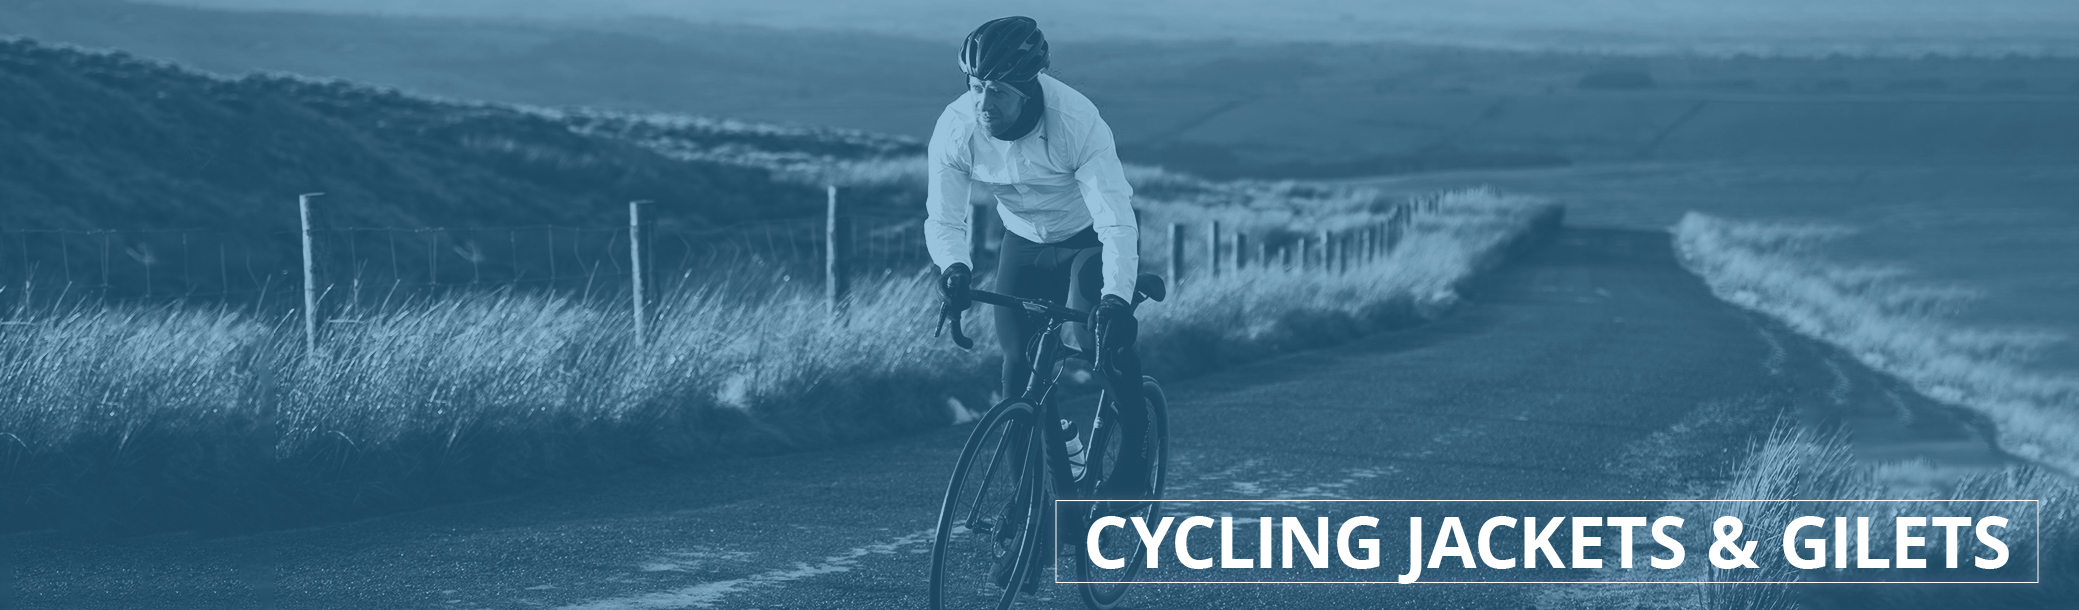 Cycling Jackets & Gilets